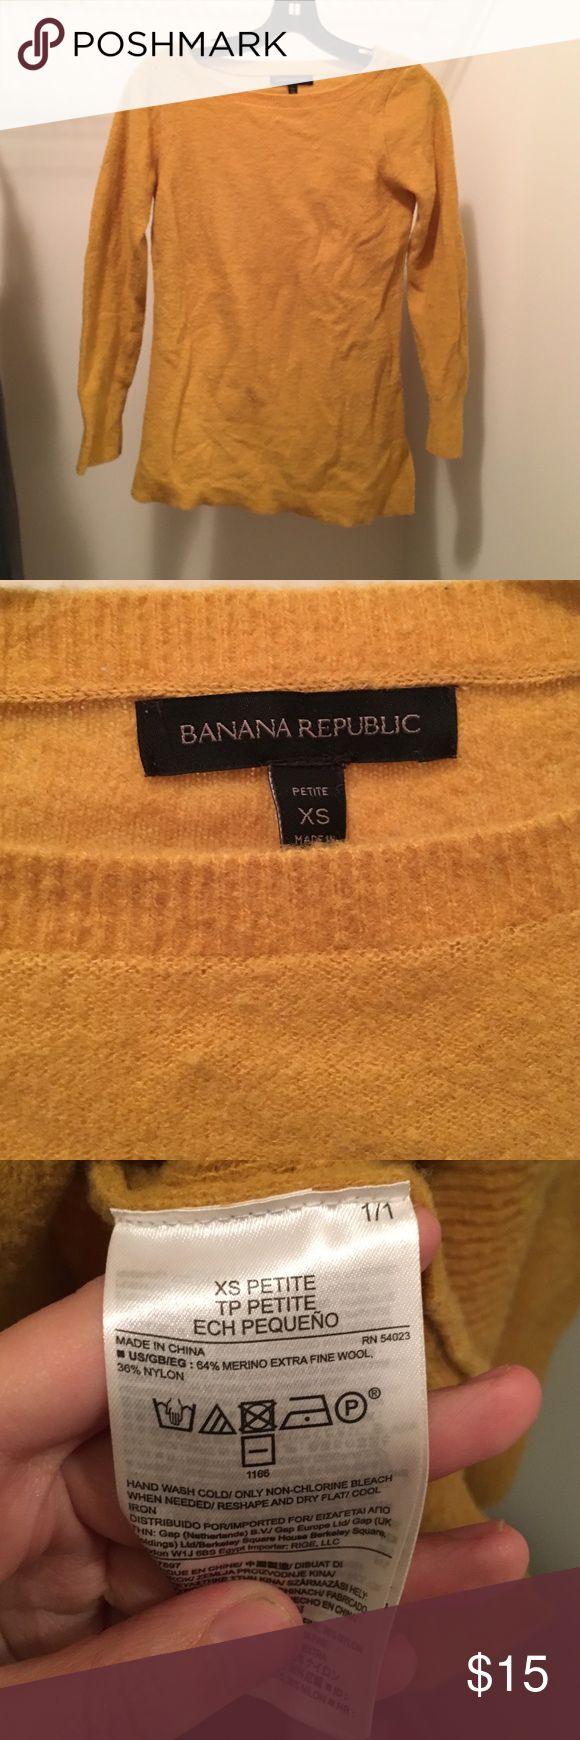 Yellow sweater Banana Republic yellow sweater in petite xs Banana Republic Tops Sweatshirts & Hoodies